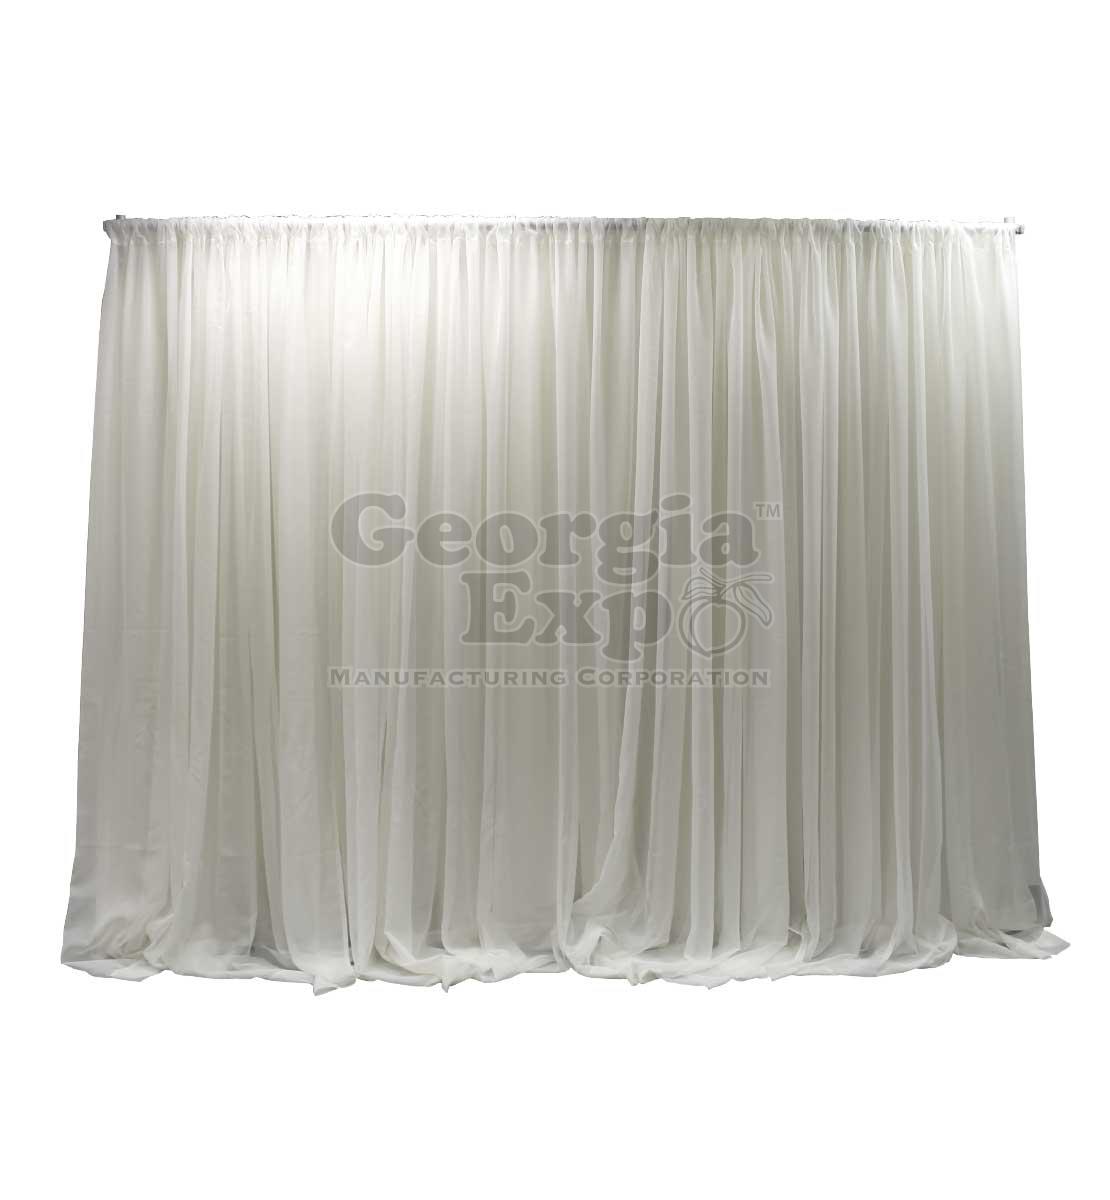 Single Layer Sheer Weeding Backdrop White